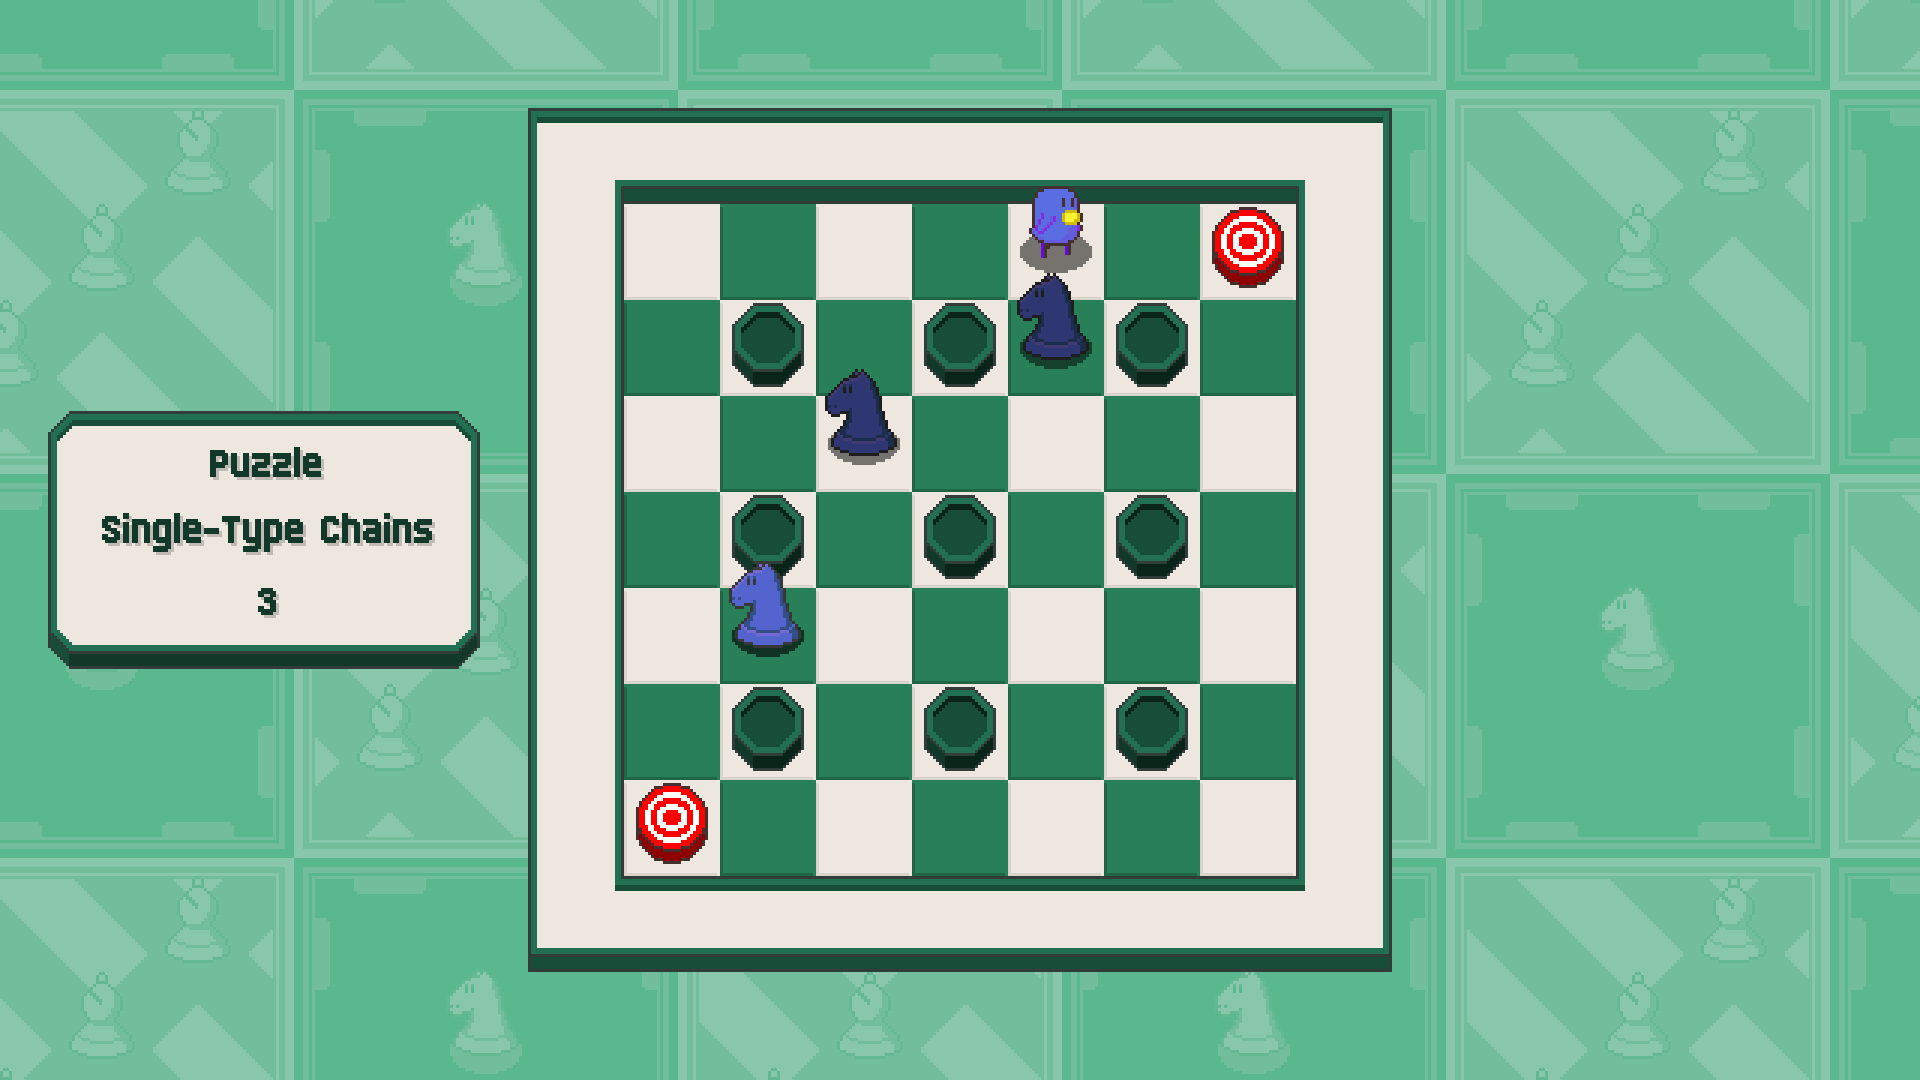 Chessplosion - Puzzle Solution Guide + Achievements Walkthrough - Advanced: Single-Type Chains - EFE175E